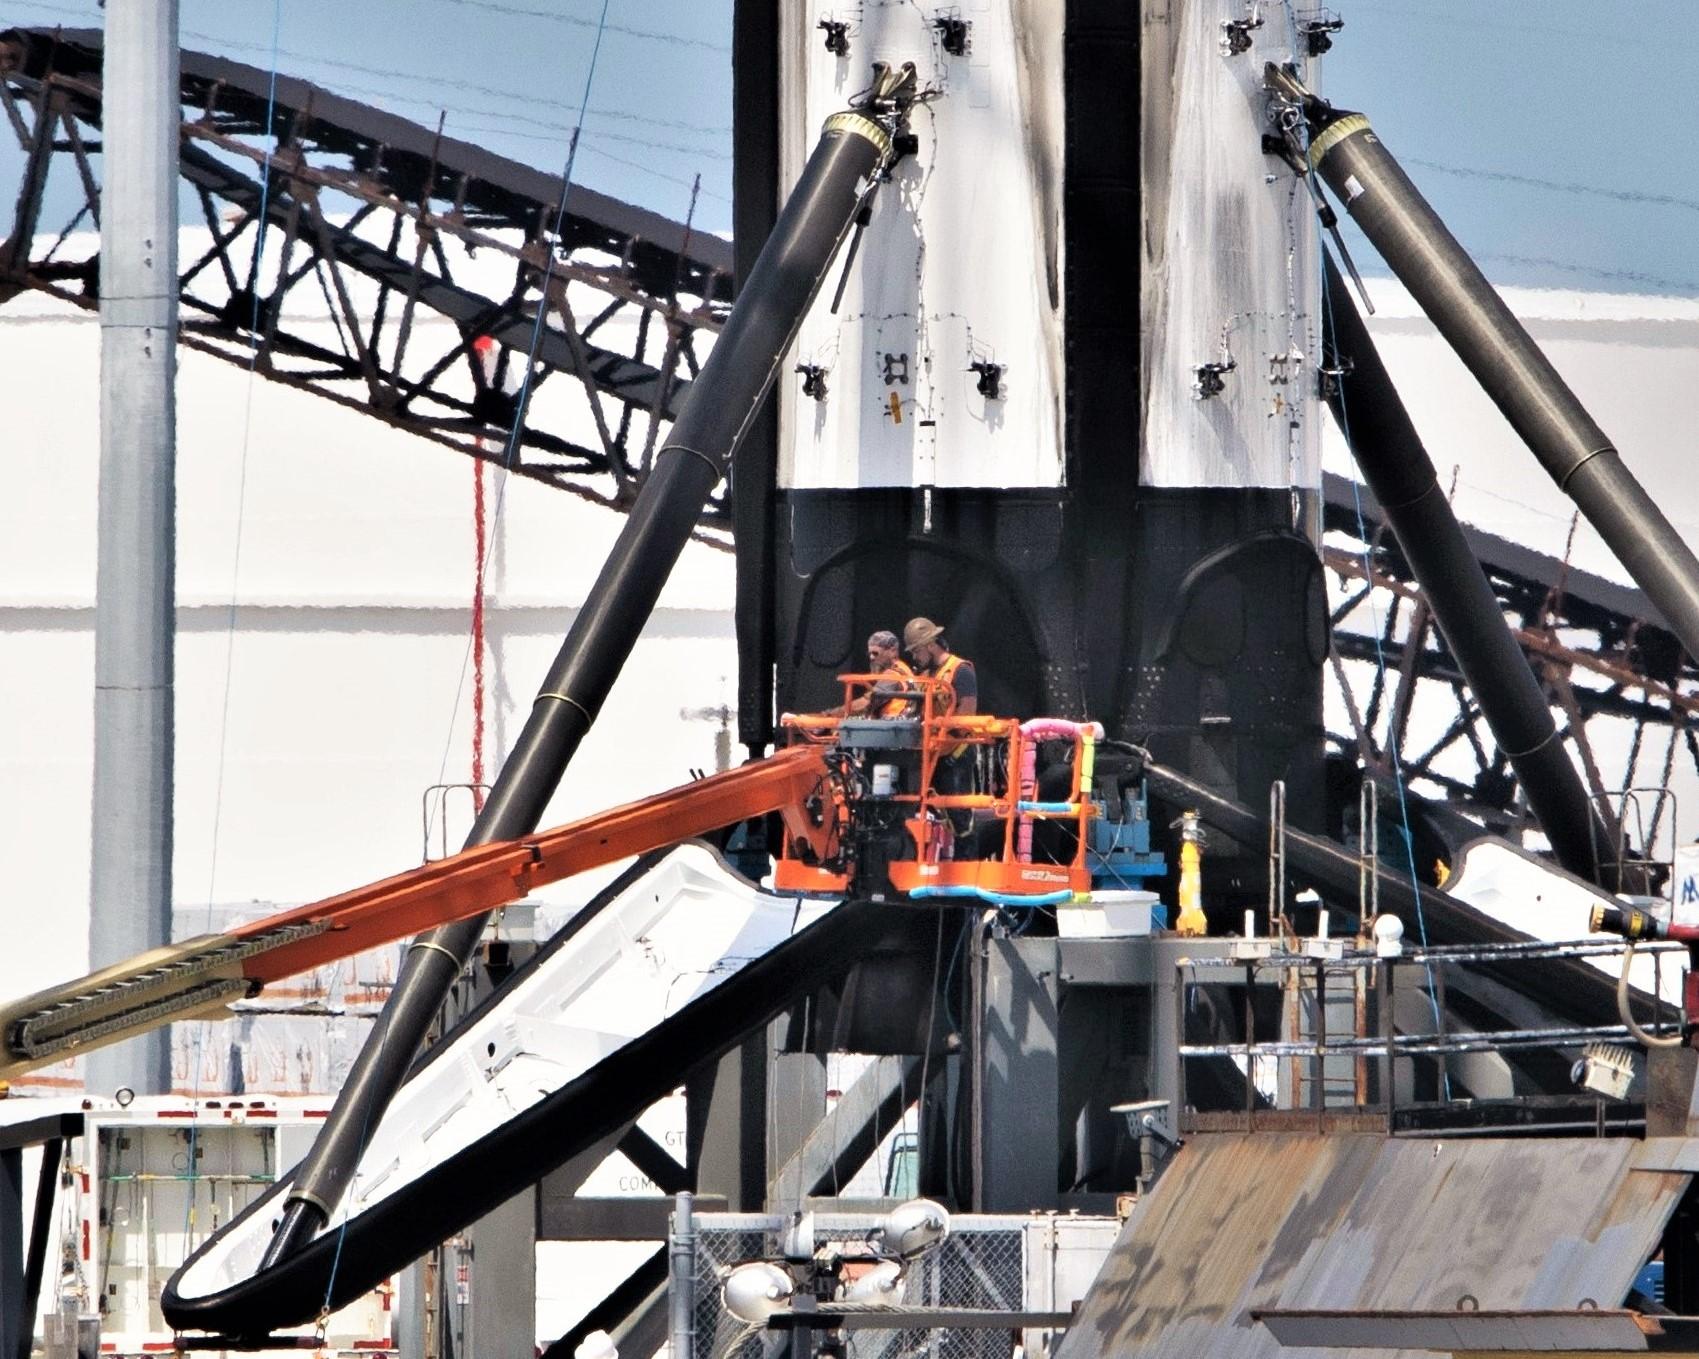 Falcon 9 b1056 leg retraction 1 of 4 050719 (Tom Cross) 1 crop